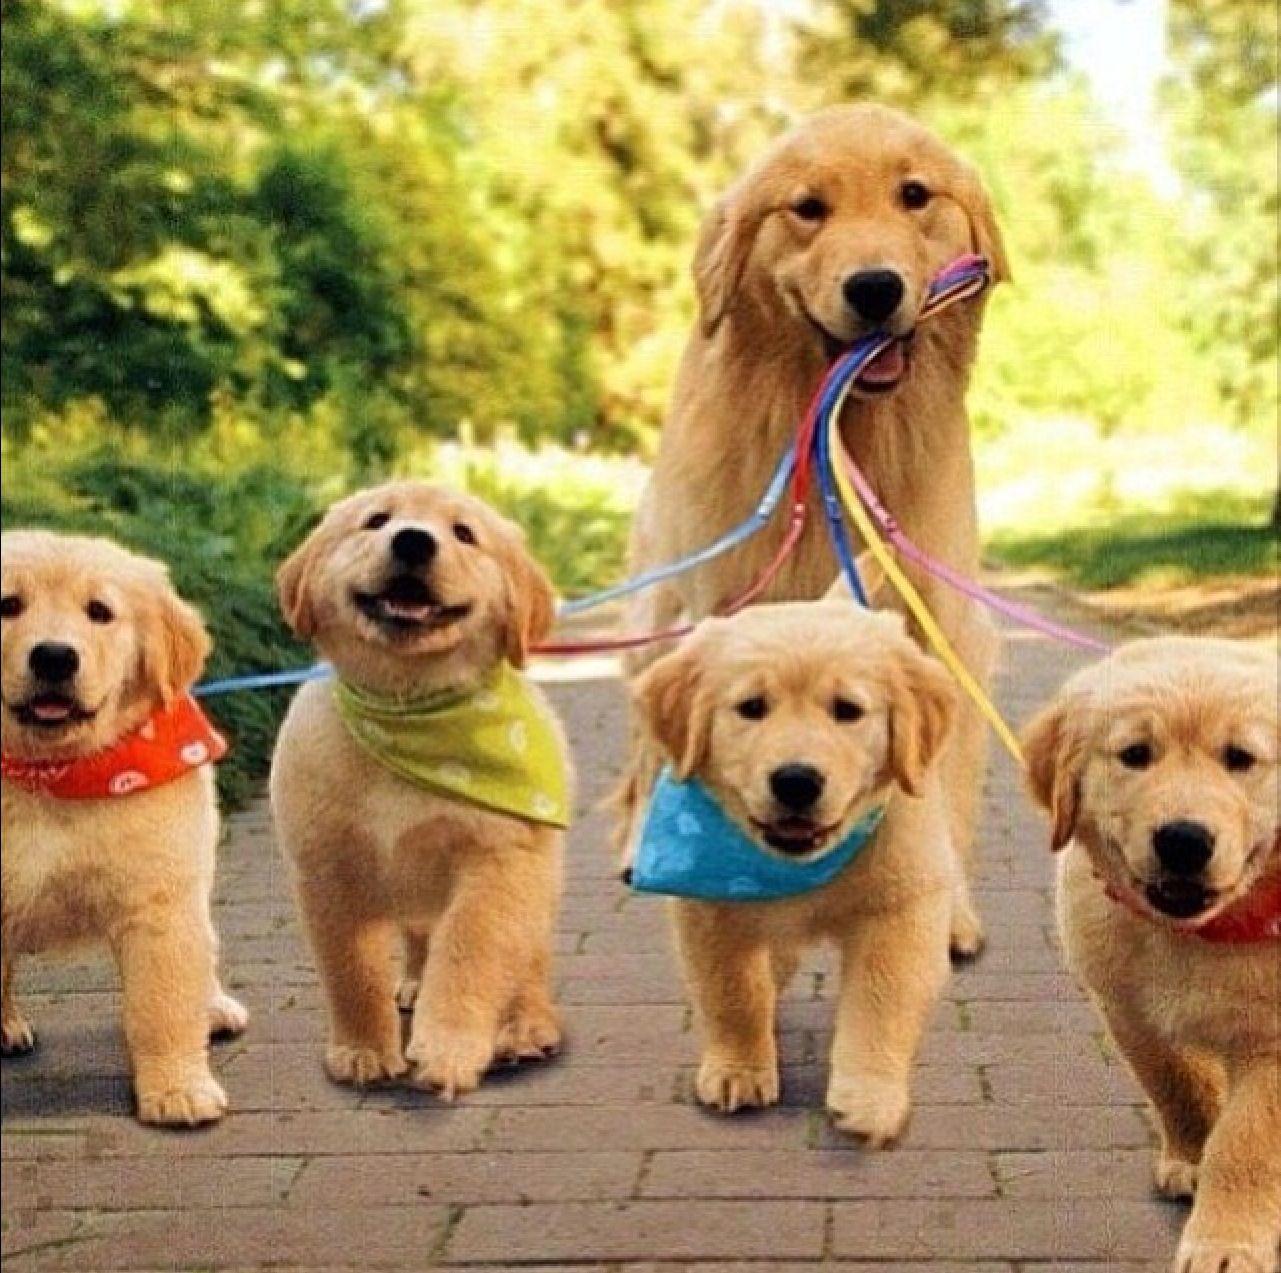 Mama Dog Walking Her Pups Pets Puppies Cute Puppies